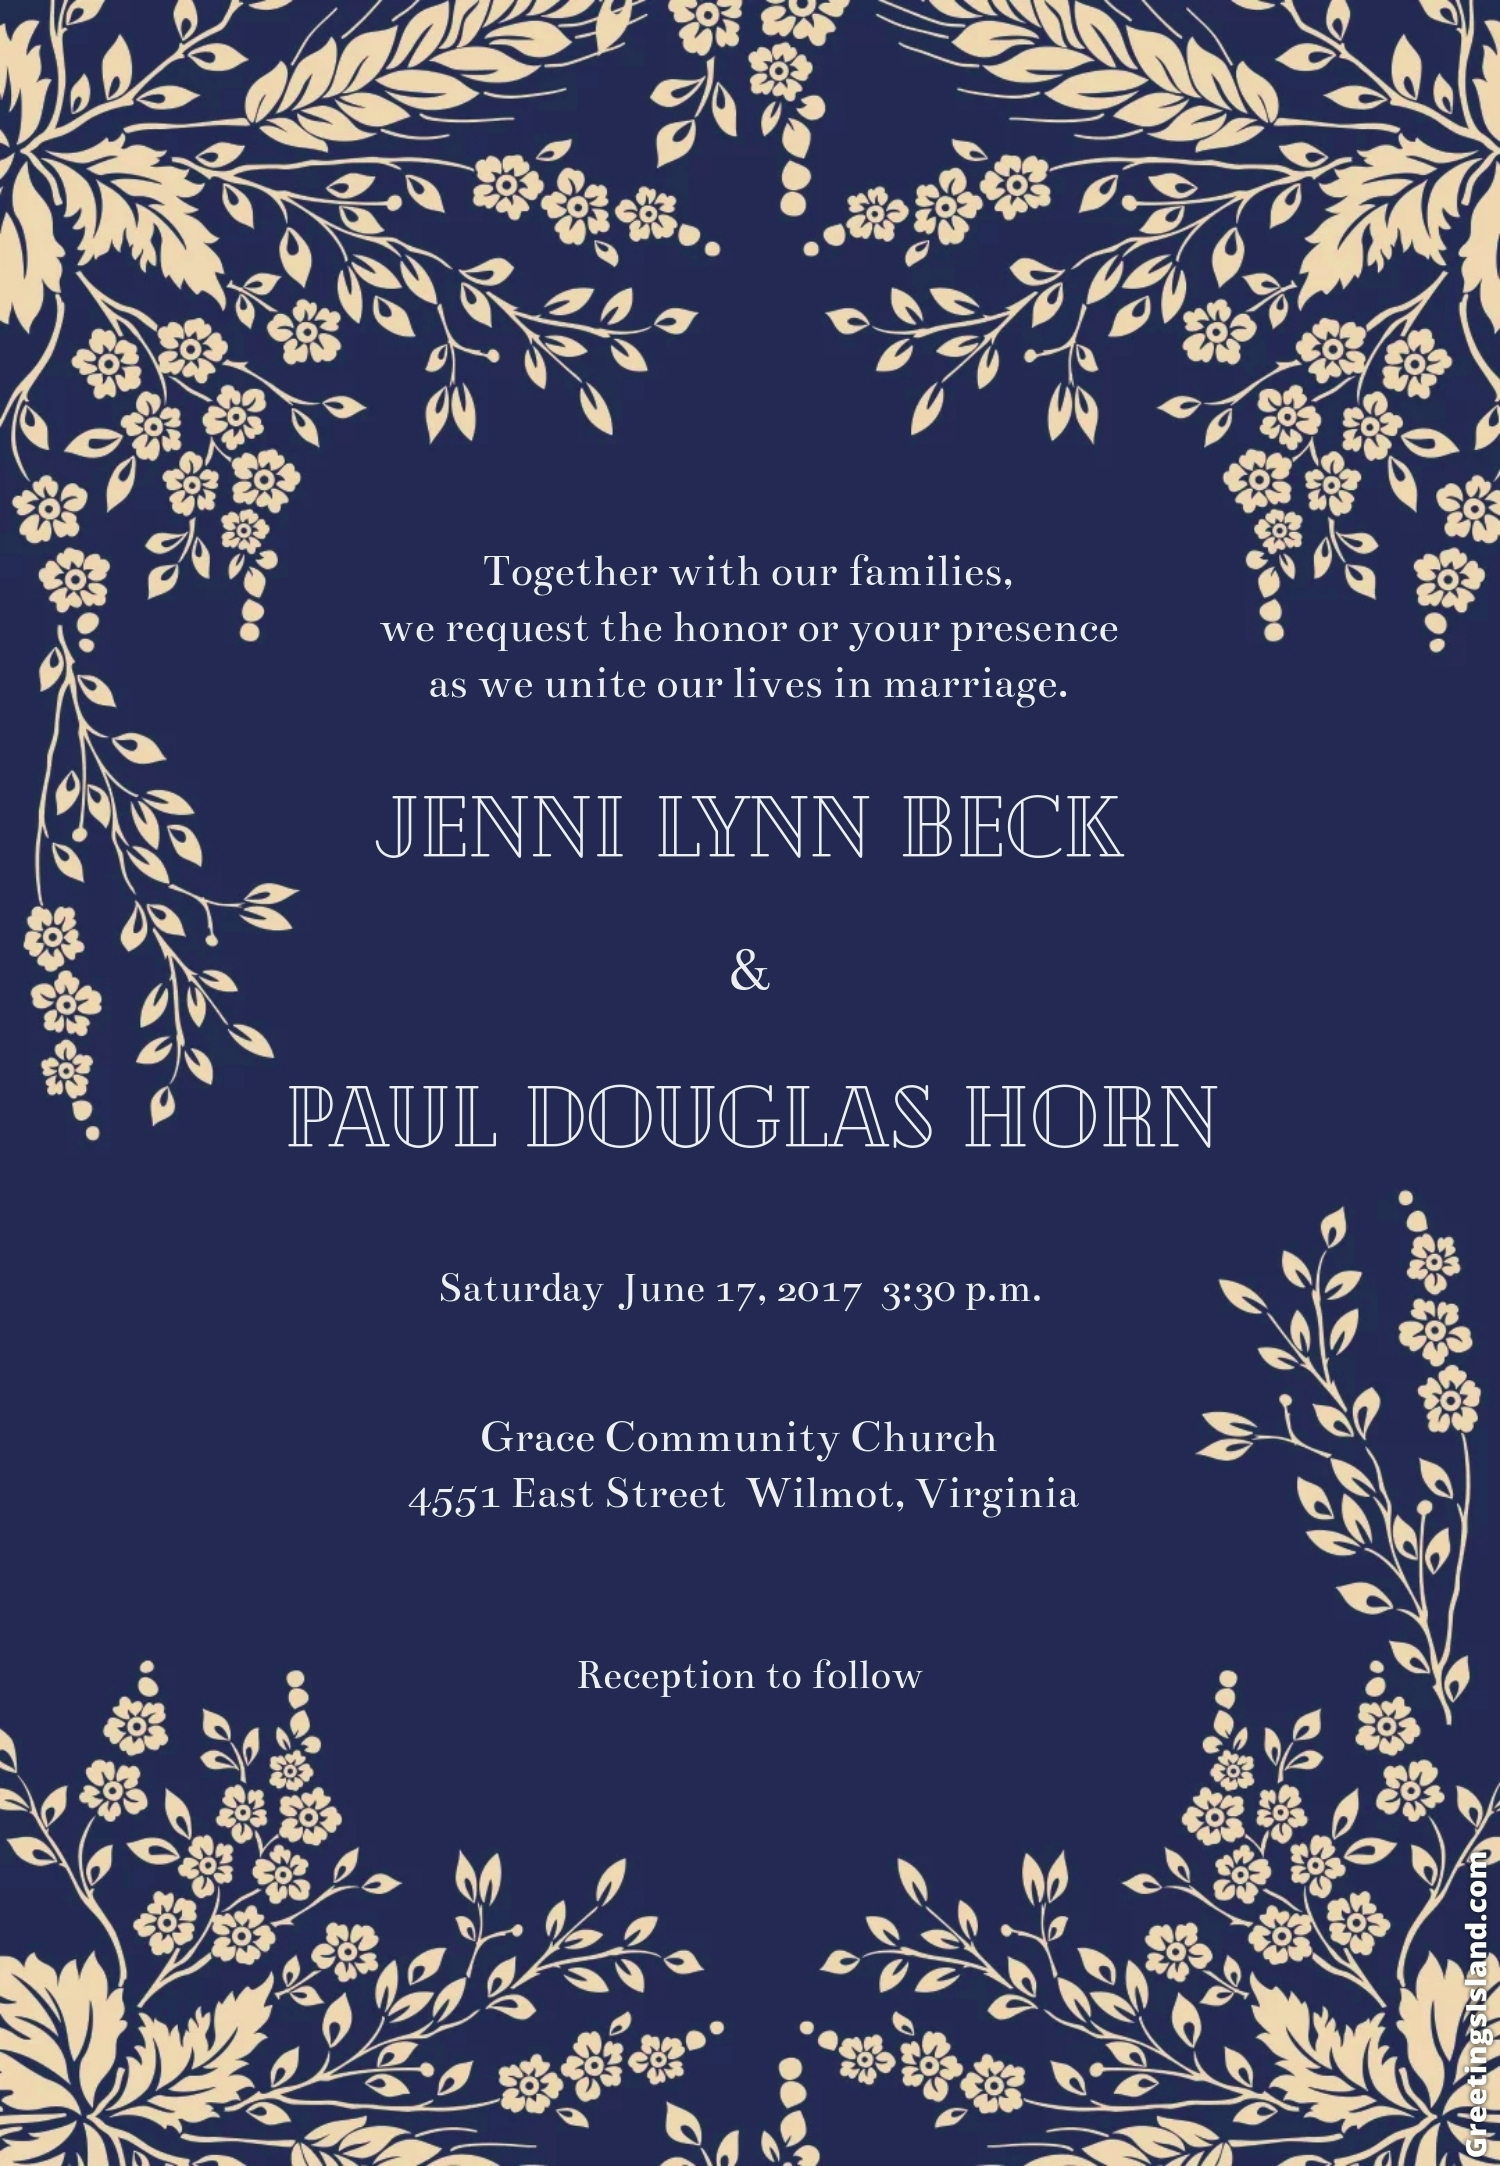 sprig sprays wedding invitation template